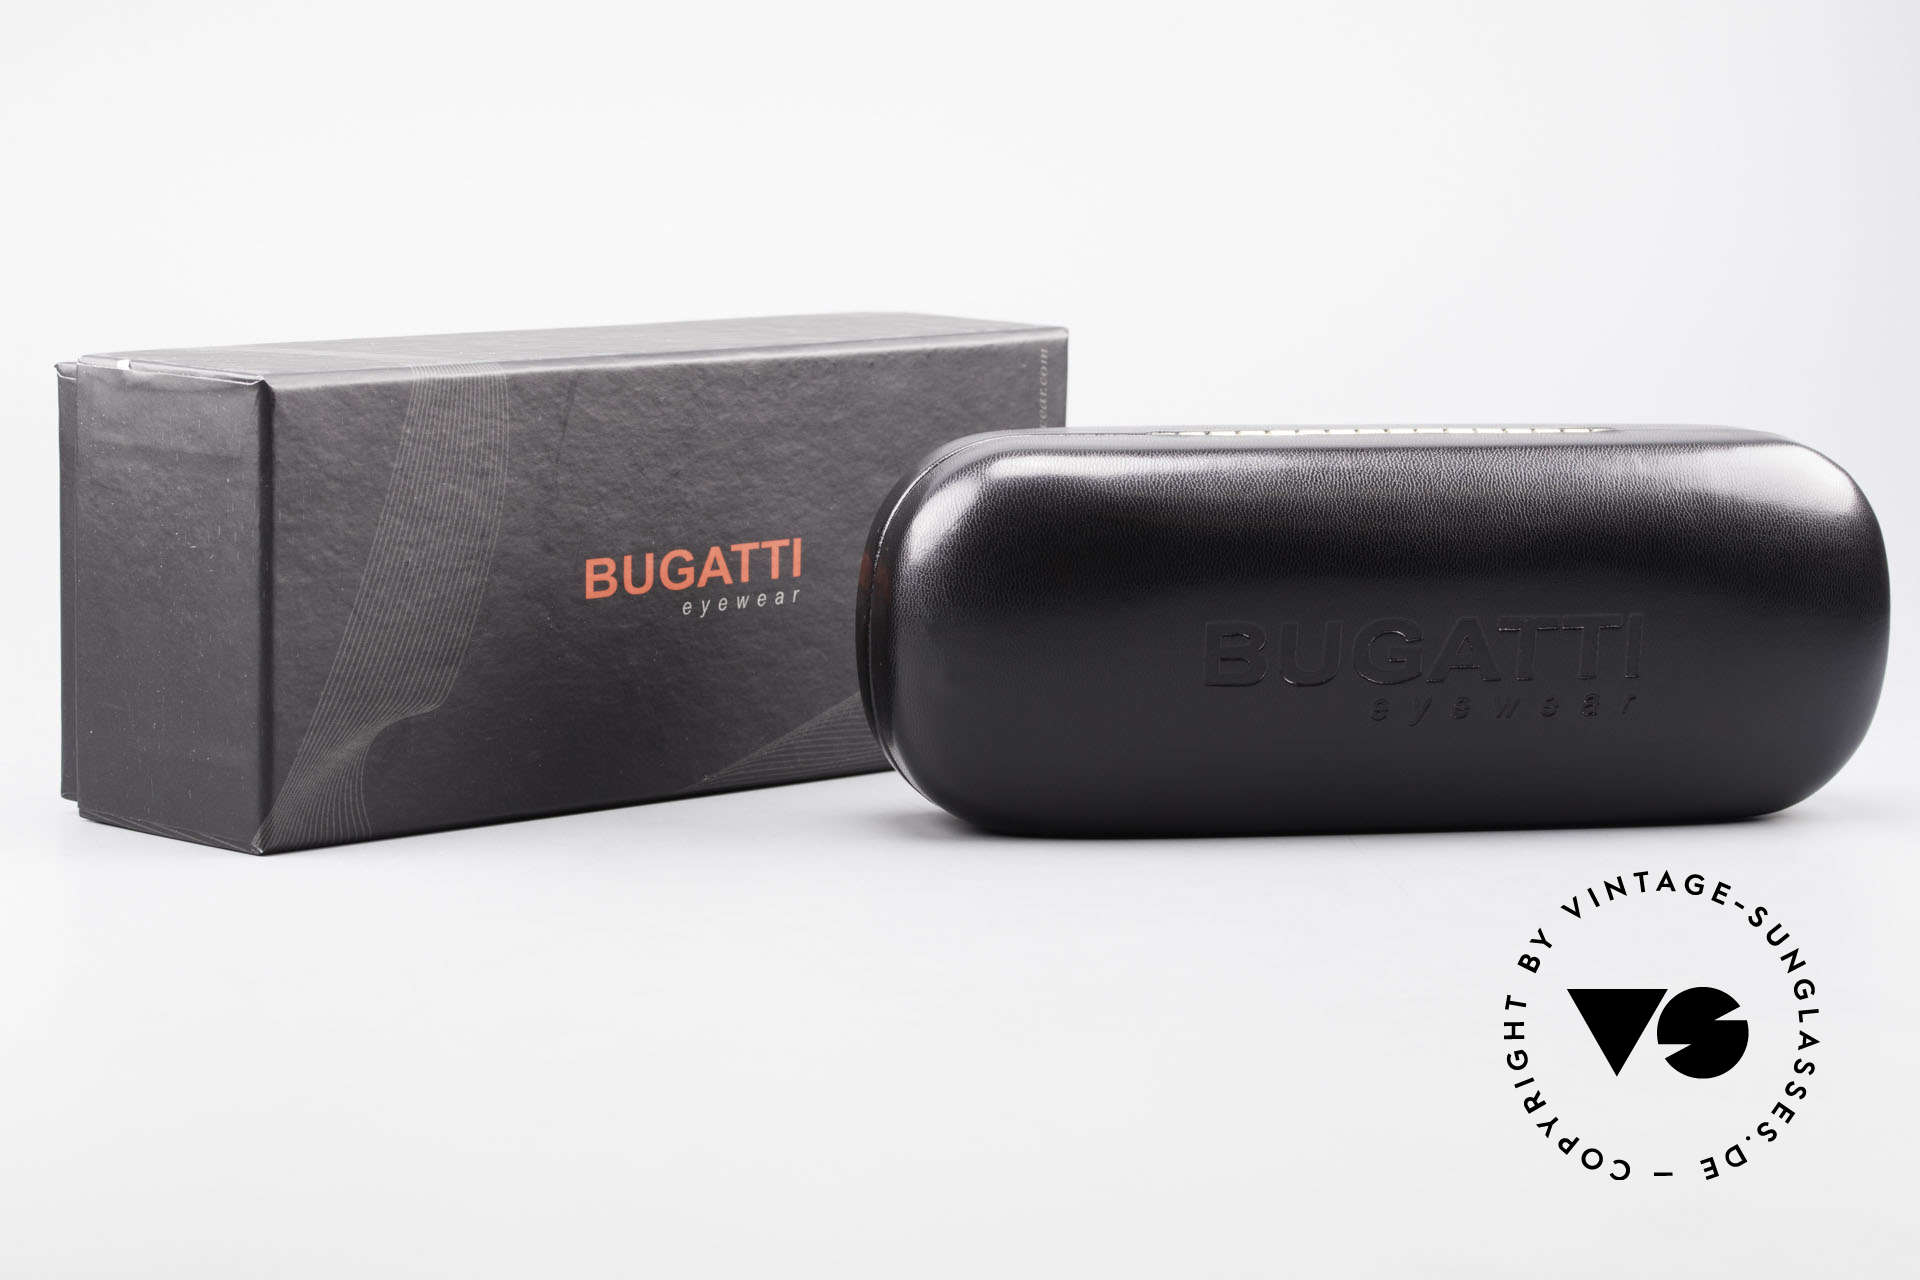 Bugatti 220 Men's Designer Luxury Glasses, Size: medium, Made for Men